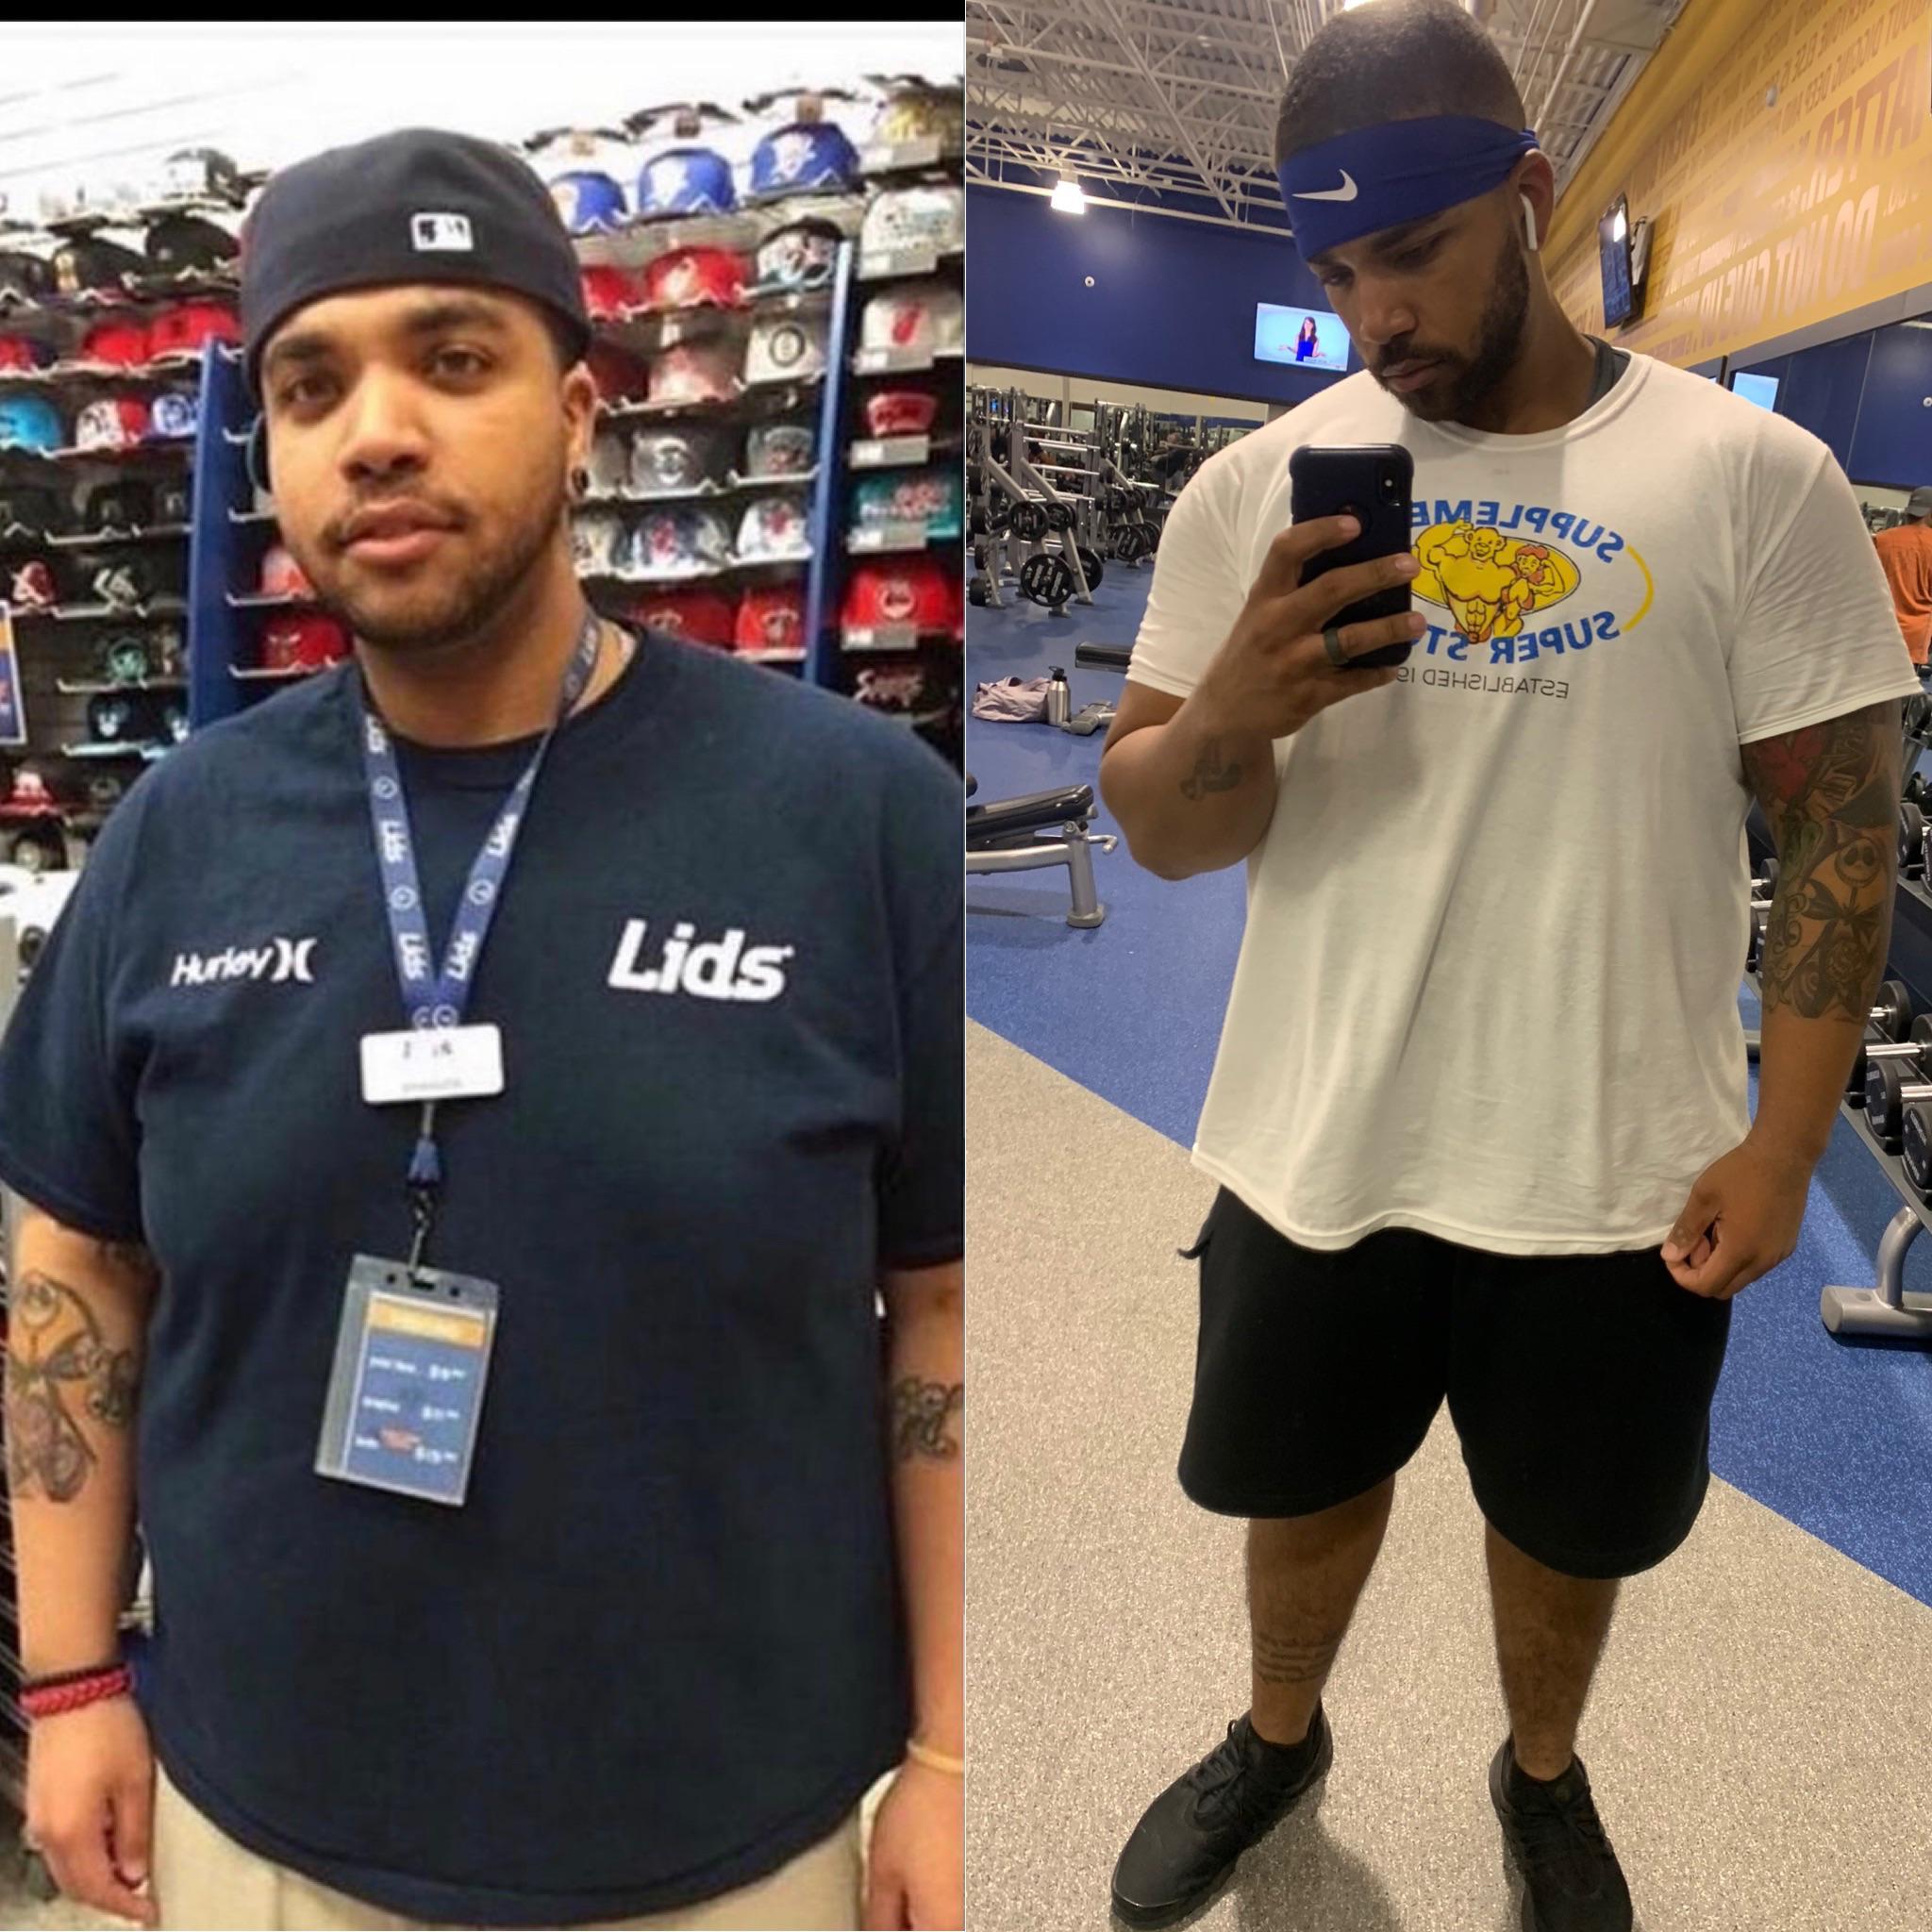 Progress Pics of 110 lbs Weight Loss 6 feet 3 Male 385 lbs to 275 lbs